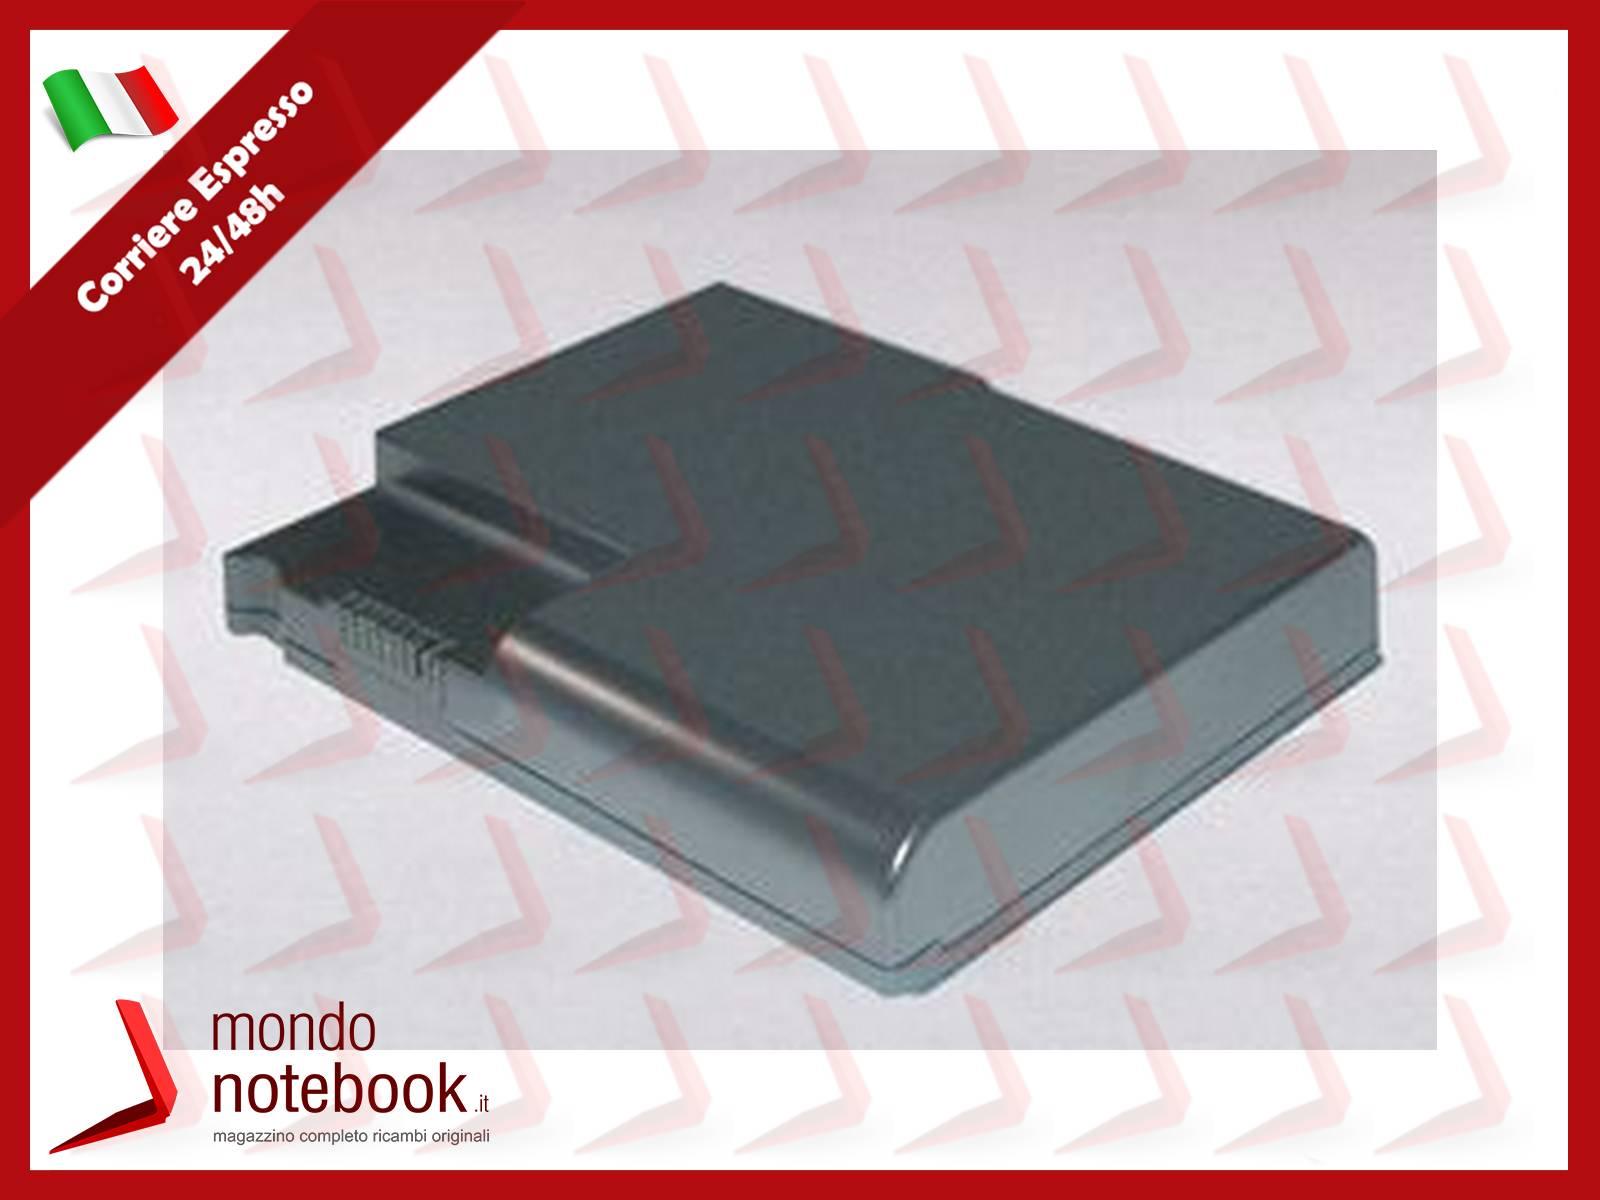 https://www.mondonotebook.it/13364/tastiera-toshiba-tecra-a40-c-nera-retroilluninata-con-trackpoint.jpg